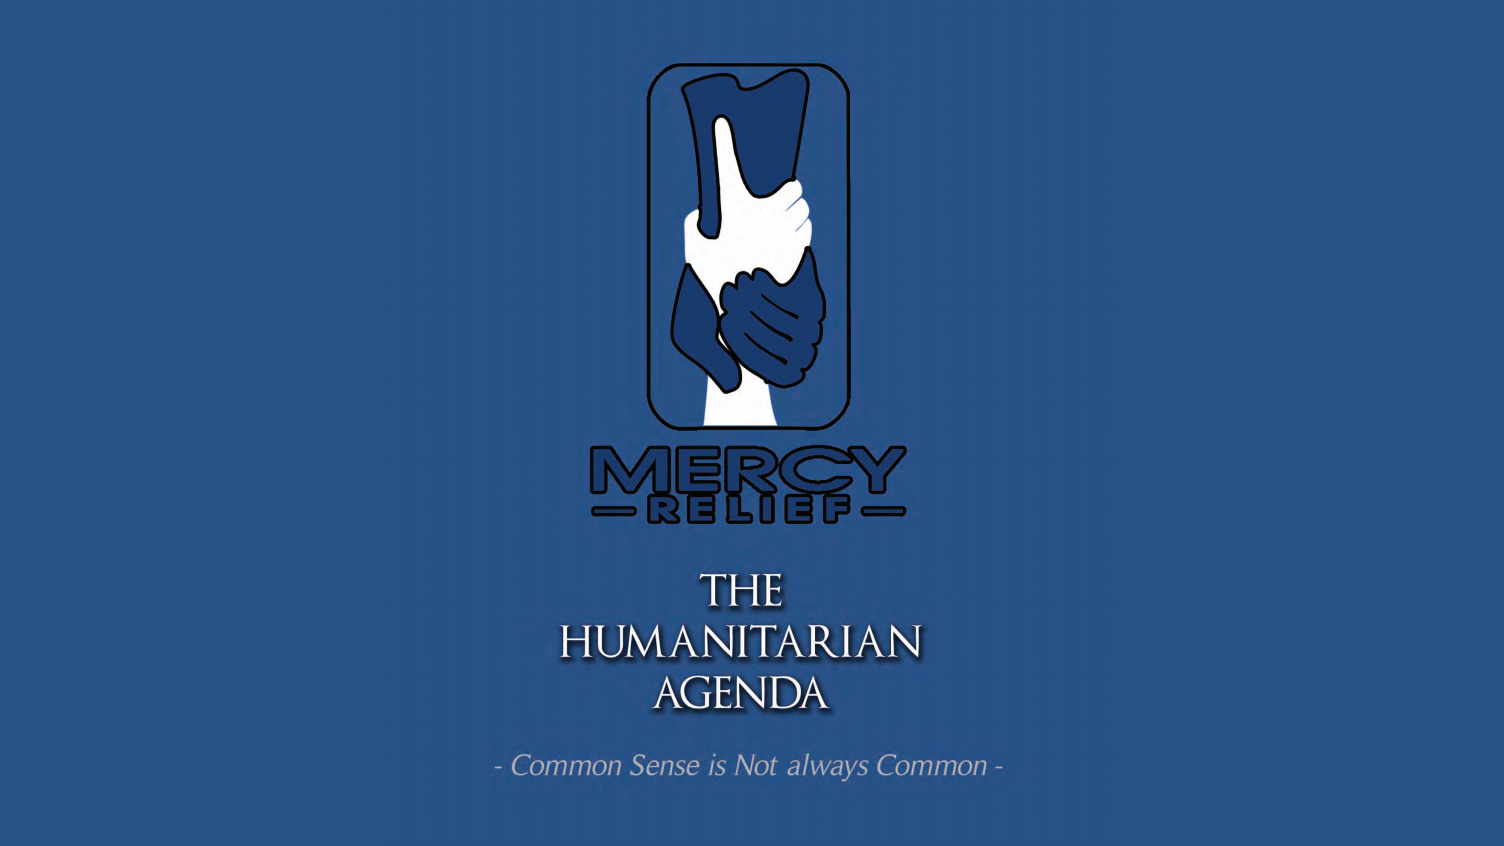 The Humanitarian Agenda, 2012